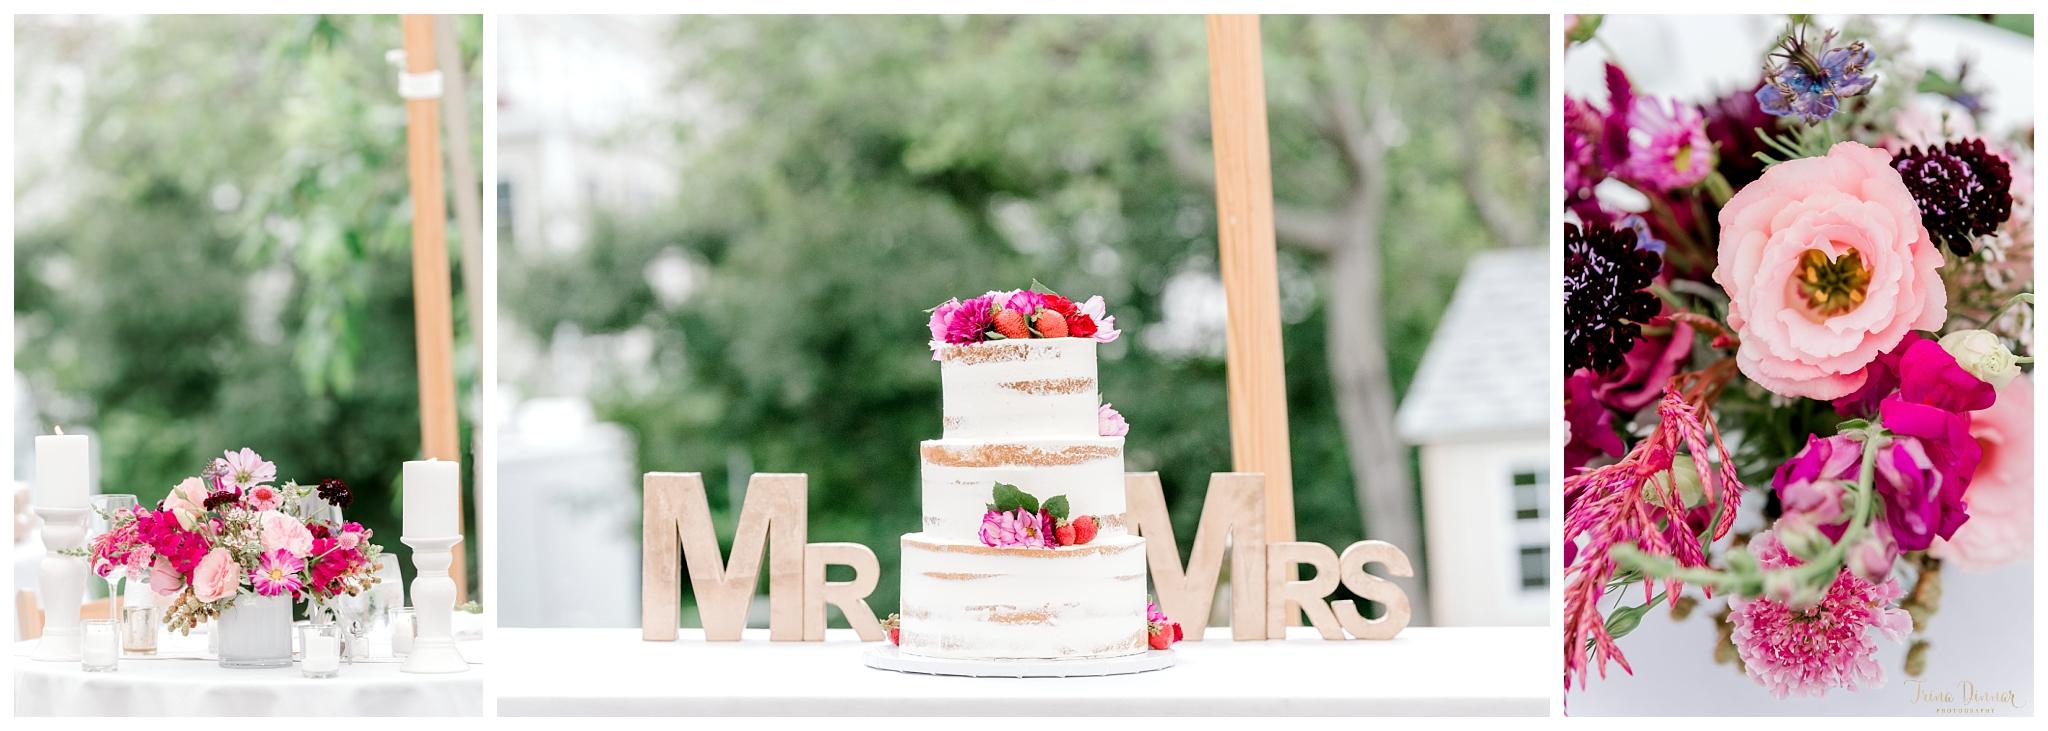 Maine Floral Wedding Decor